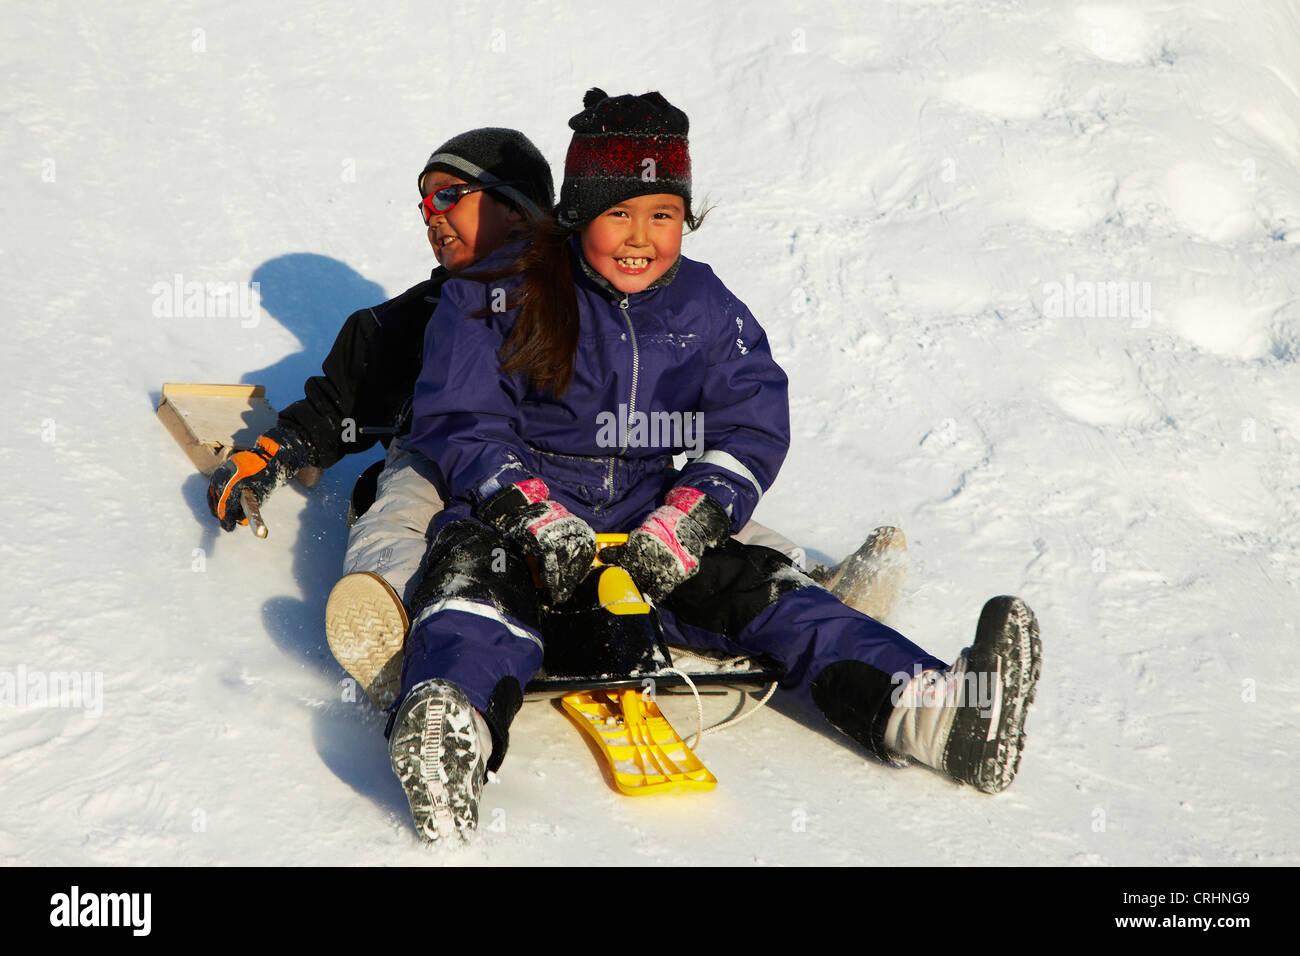 children playing in the snow, Greenland, Ostgroenland, Tunu, Kalaallit Nunaat, Scoresbysund, Kangertittivag, Ittoqqortoormiit - Stock Image